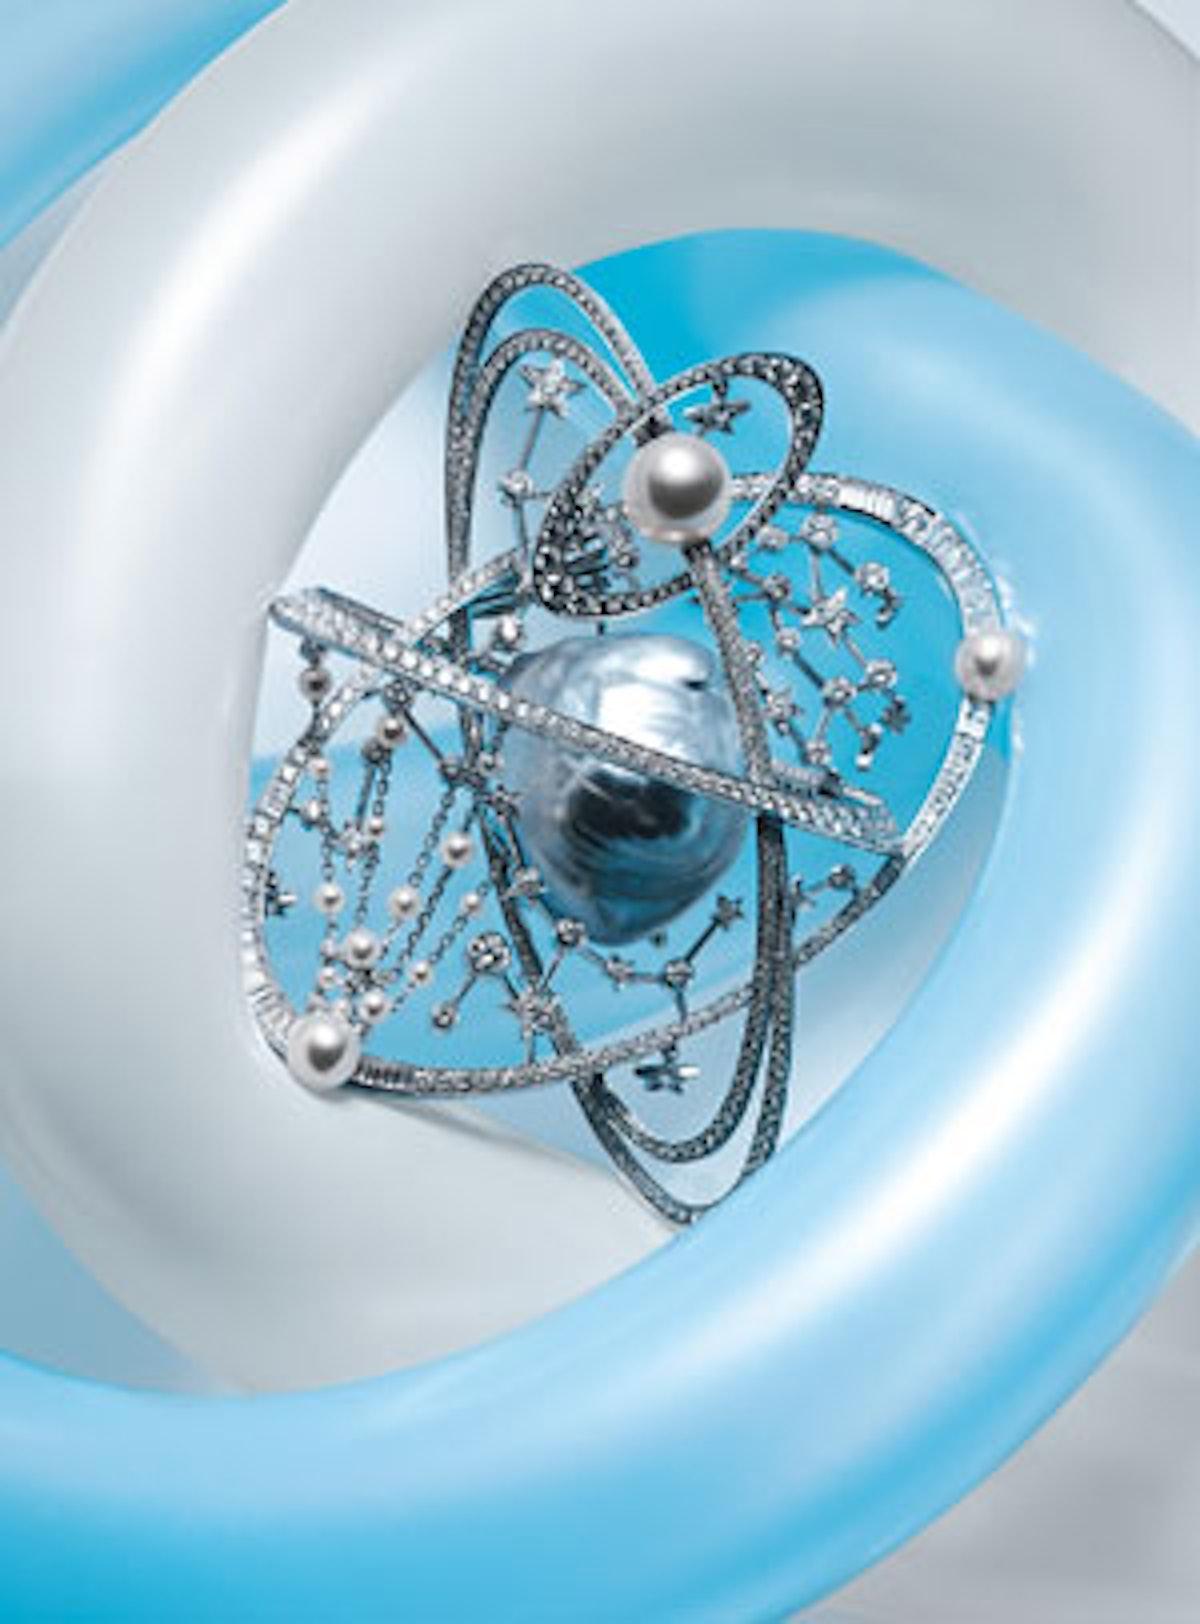 acar-chanel-jewelry-v.jpg